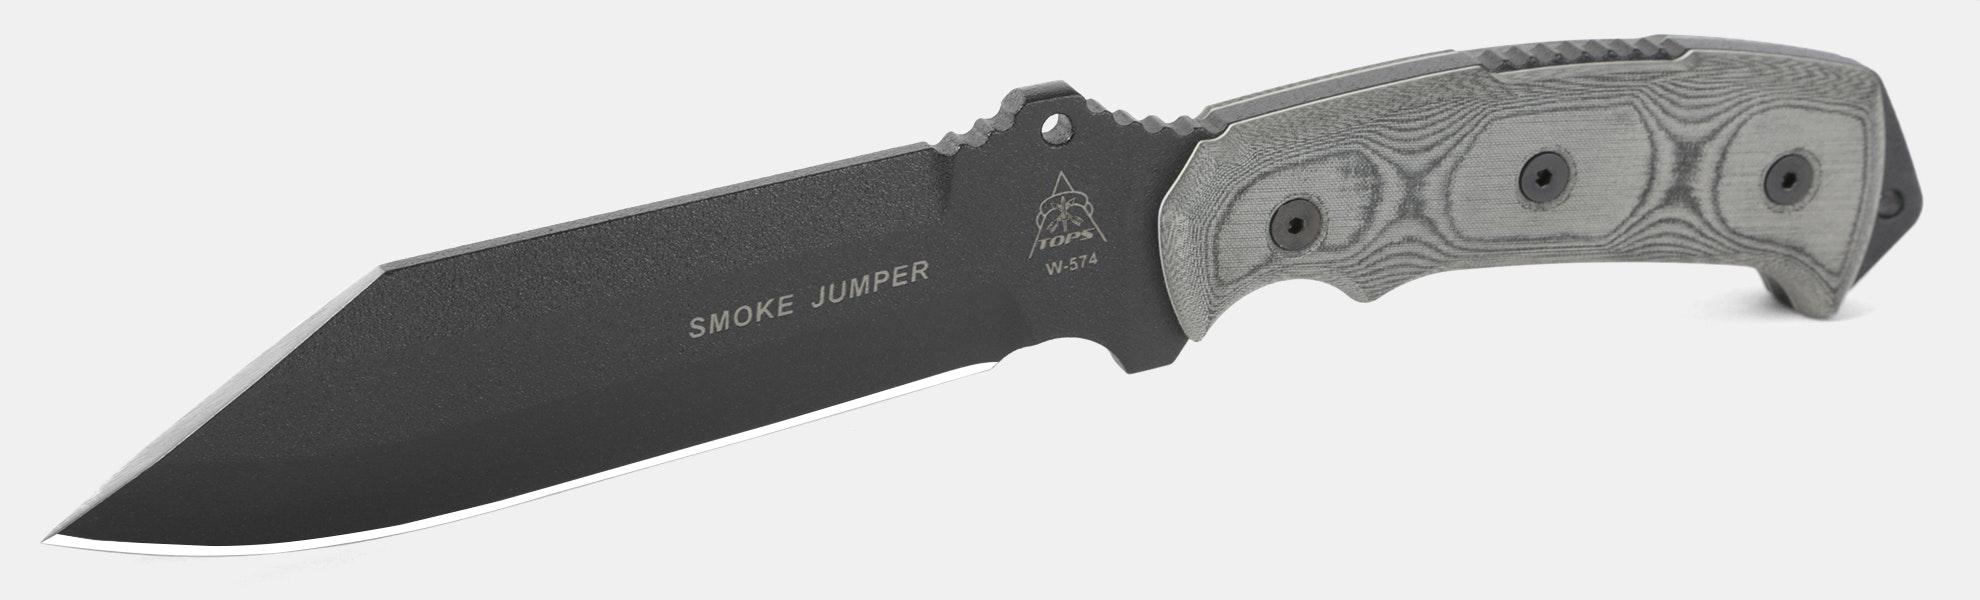 TOPS Knives Smoke Jumper Knife Fixed Blade